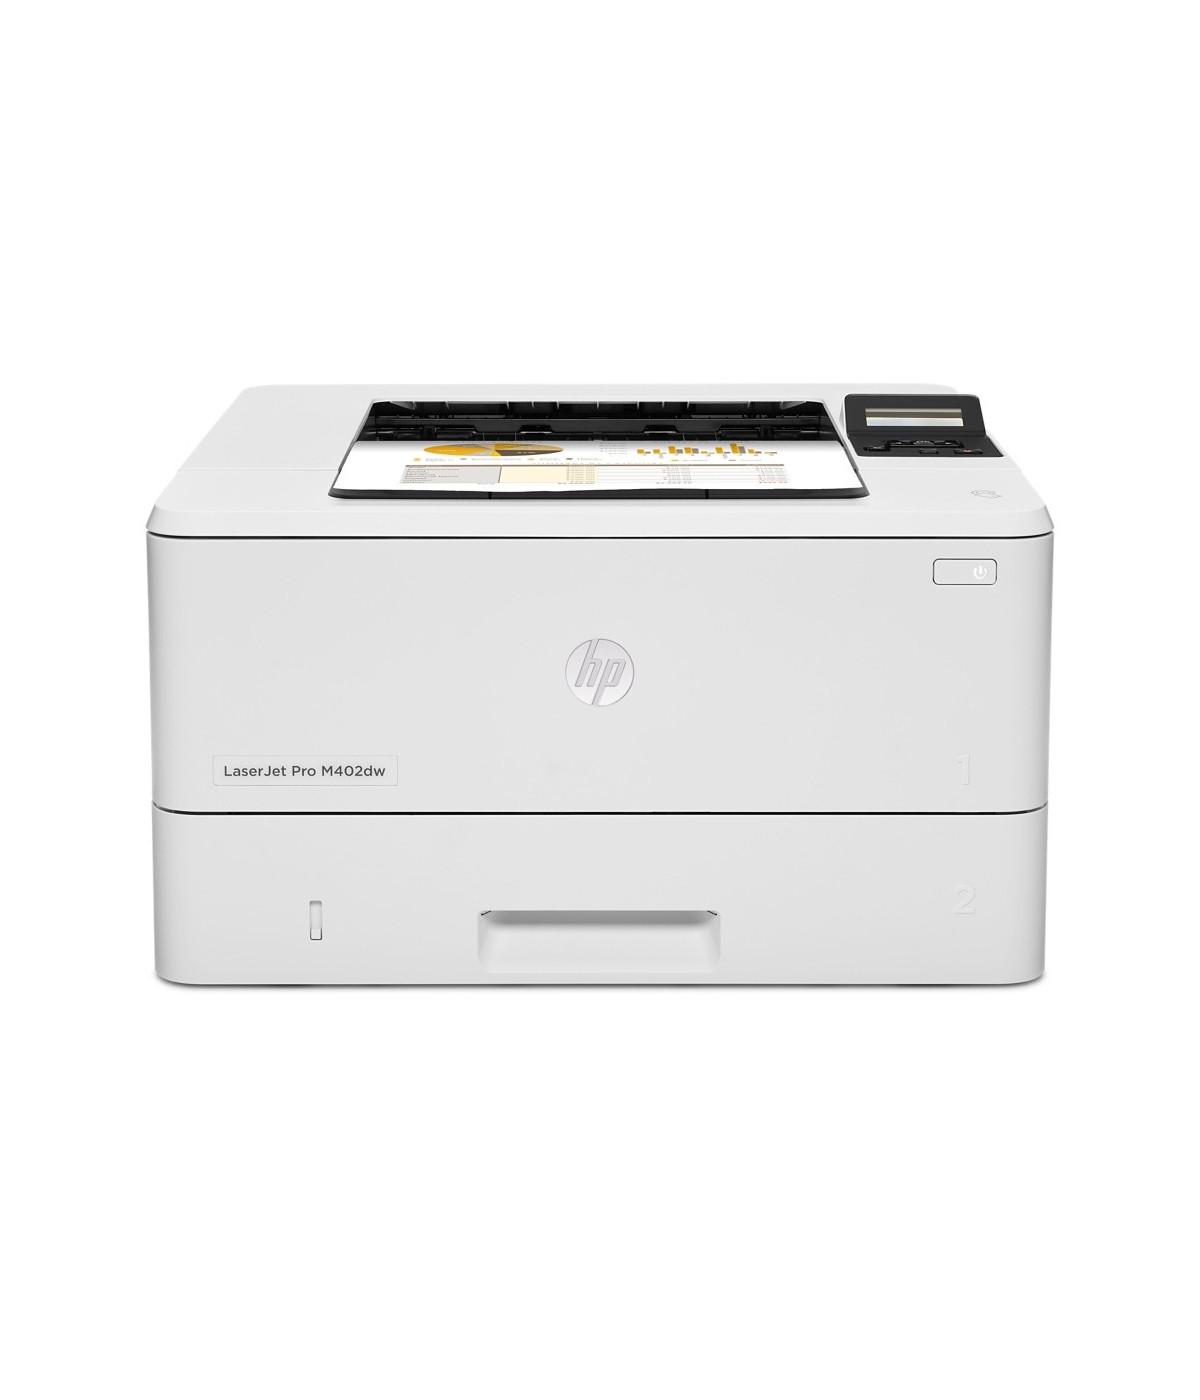 IMPRESORA HP LASERJET M402DW C5F95A